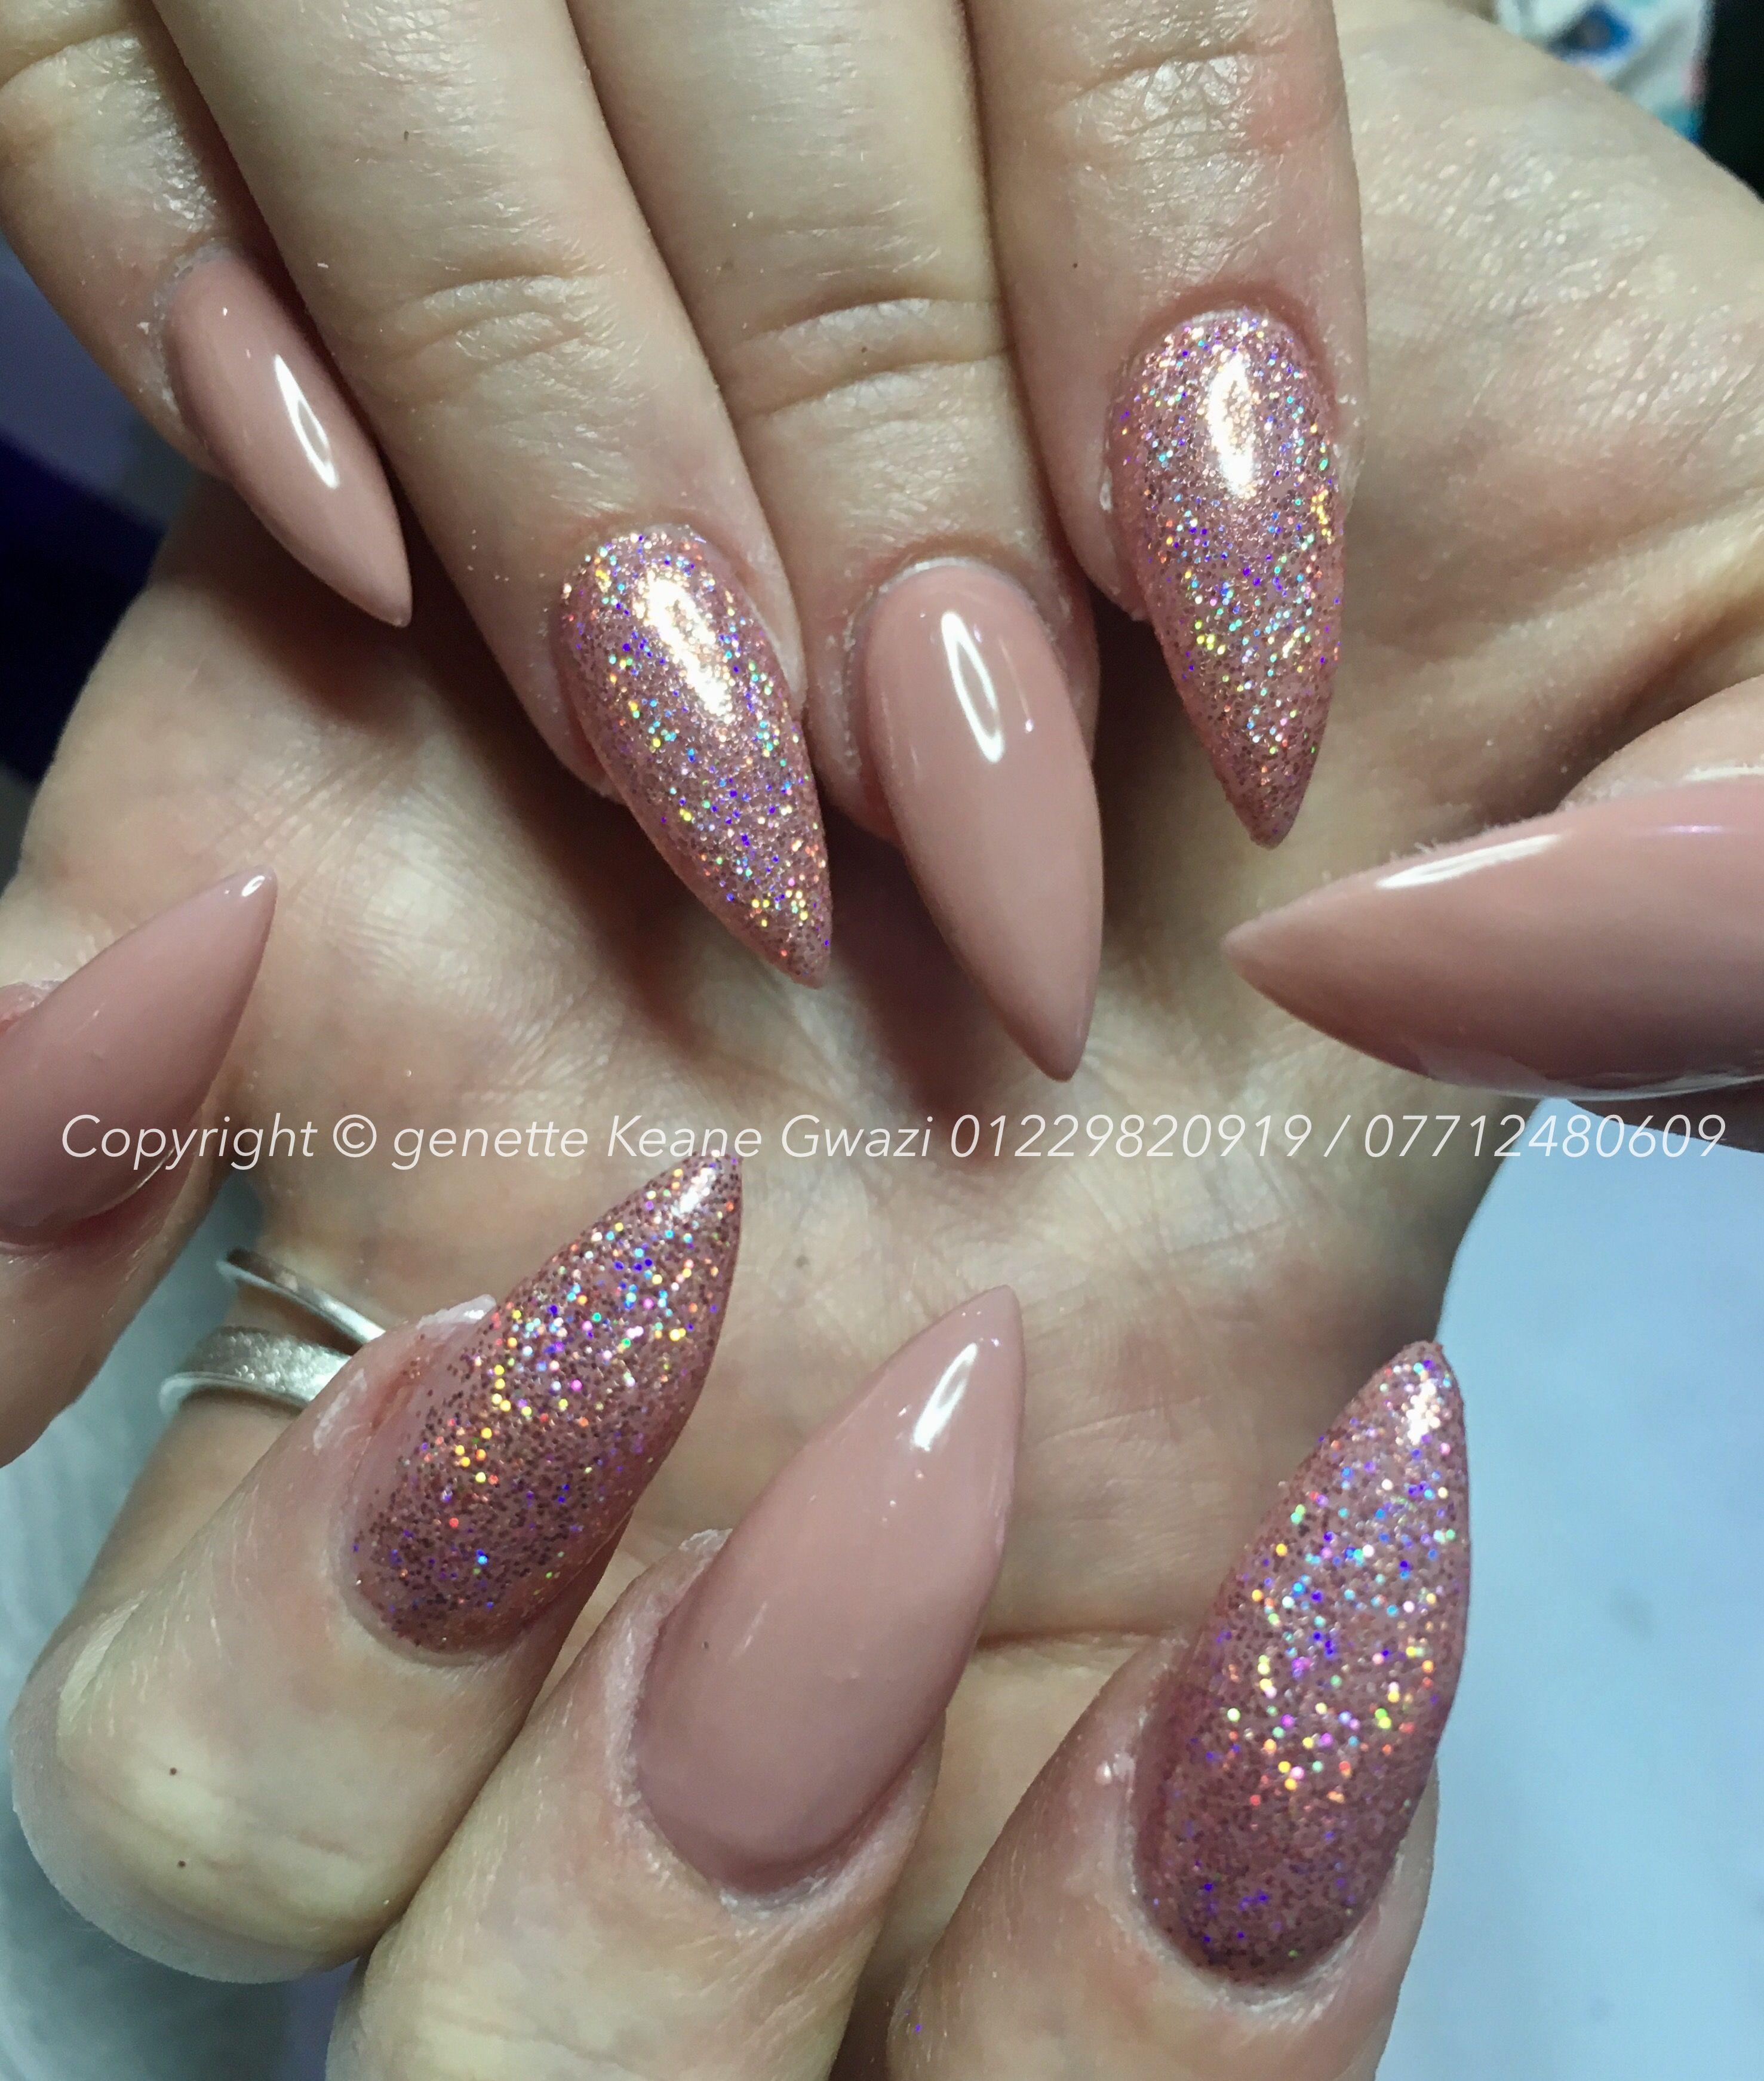 Blackheart nail polish uk dating 10